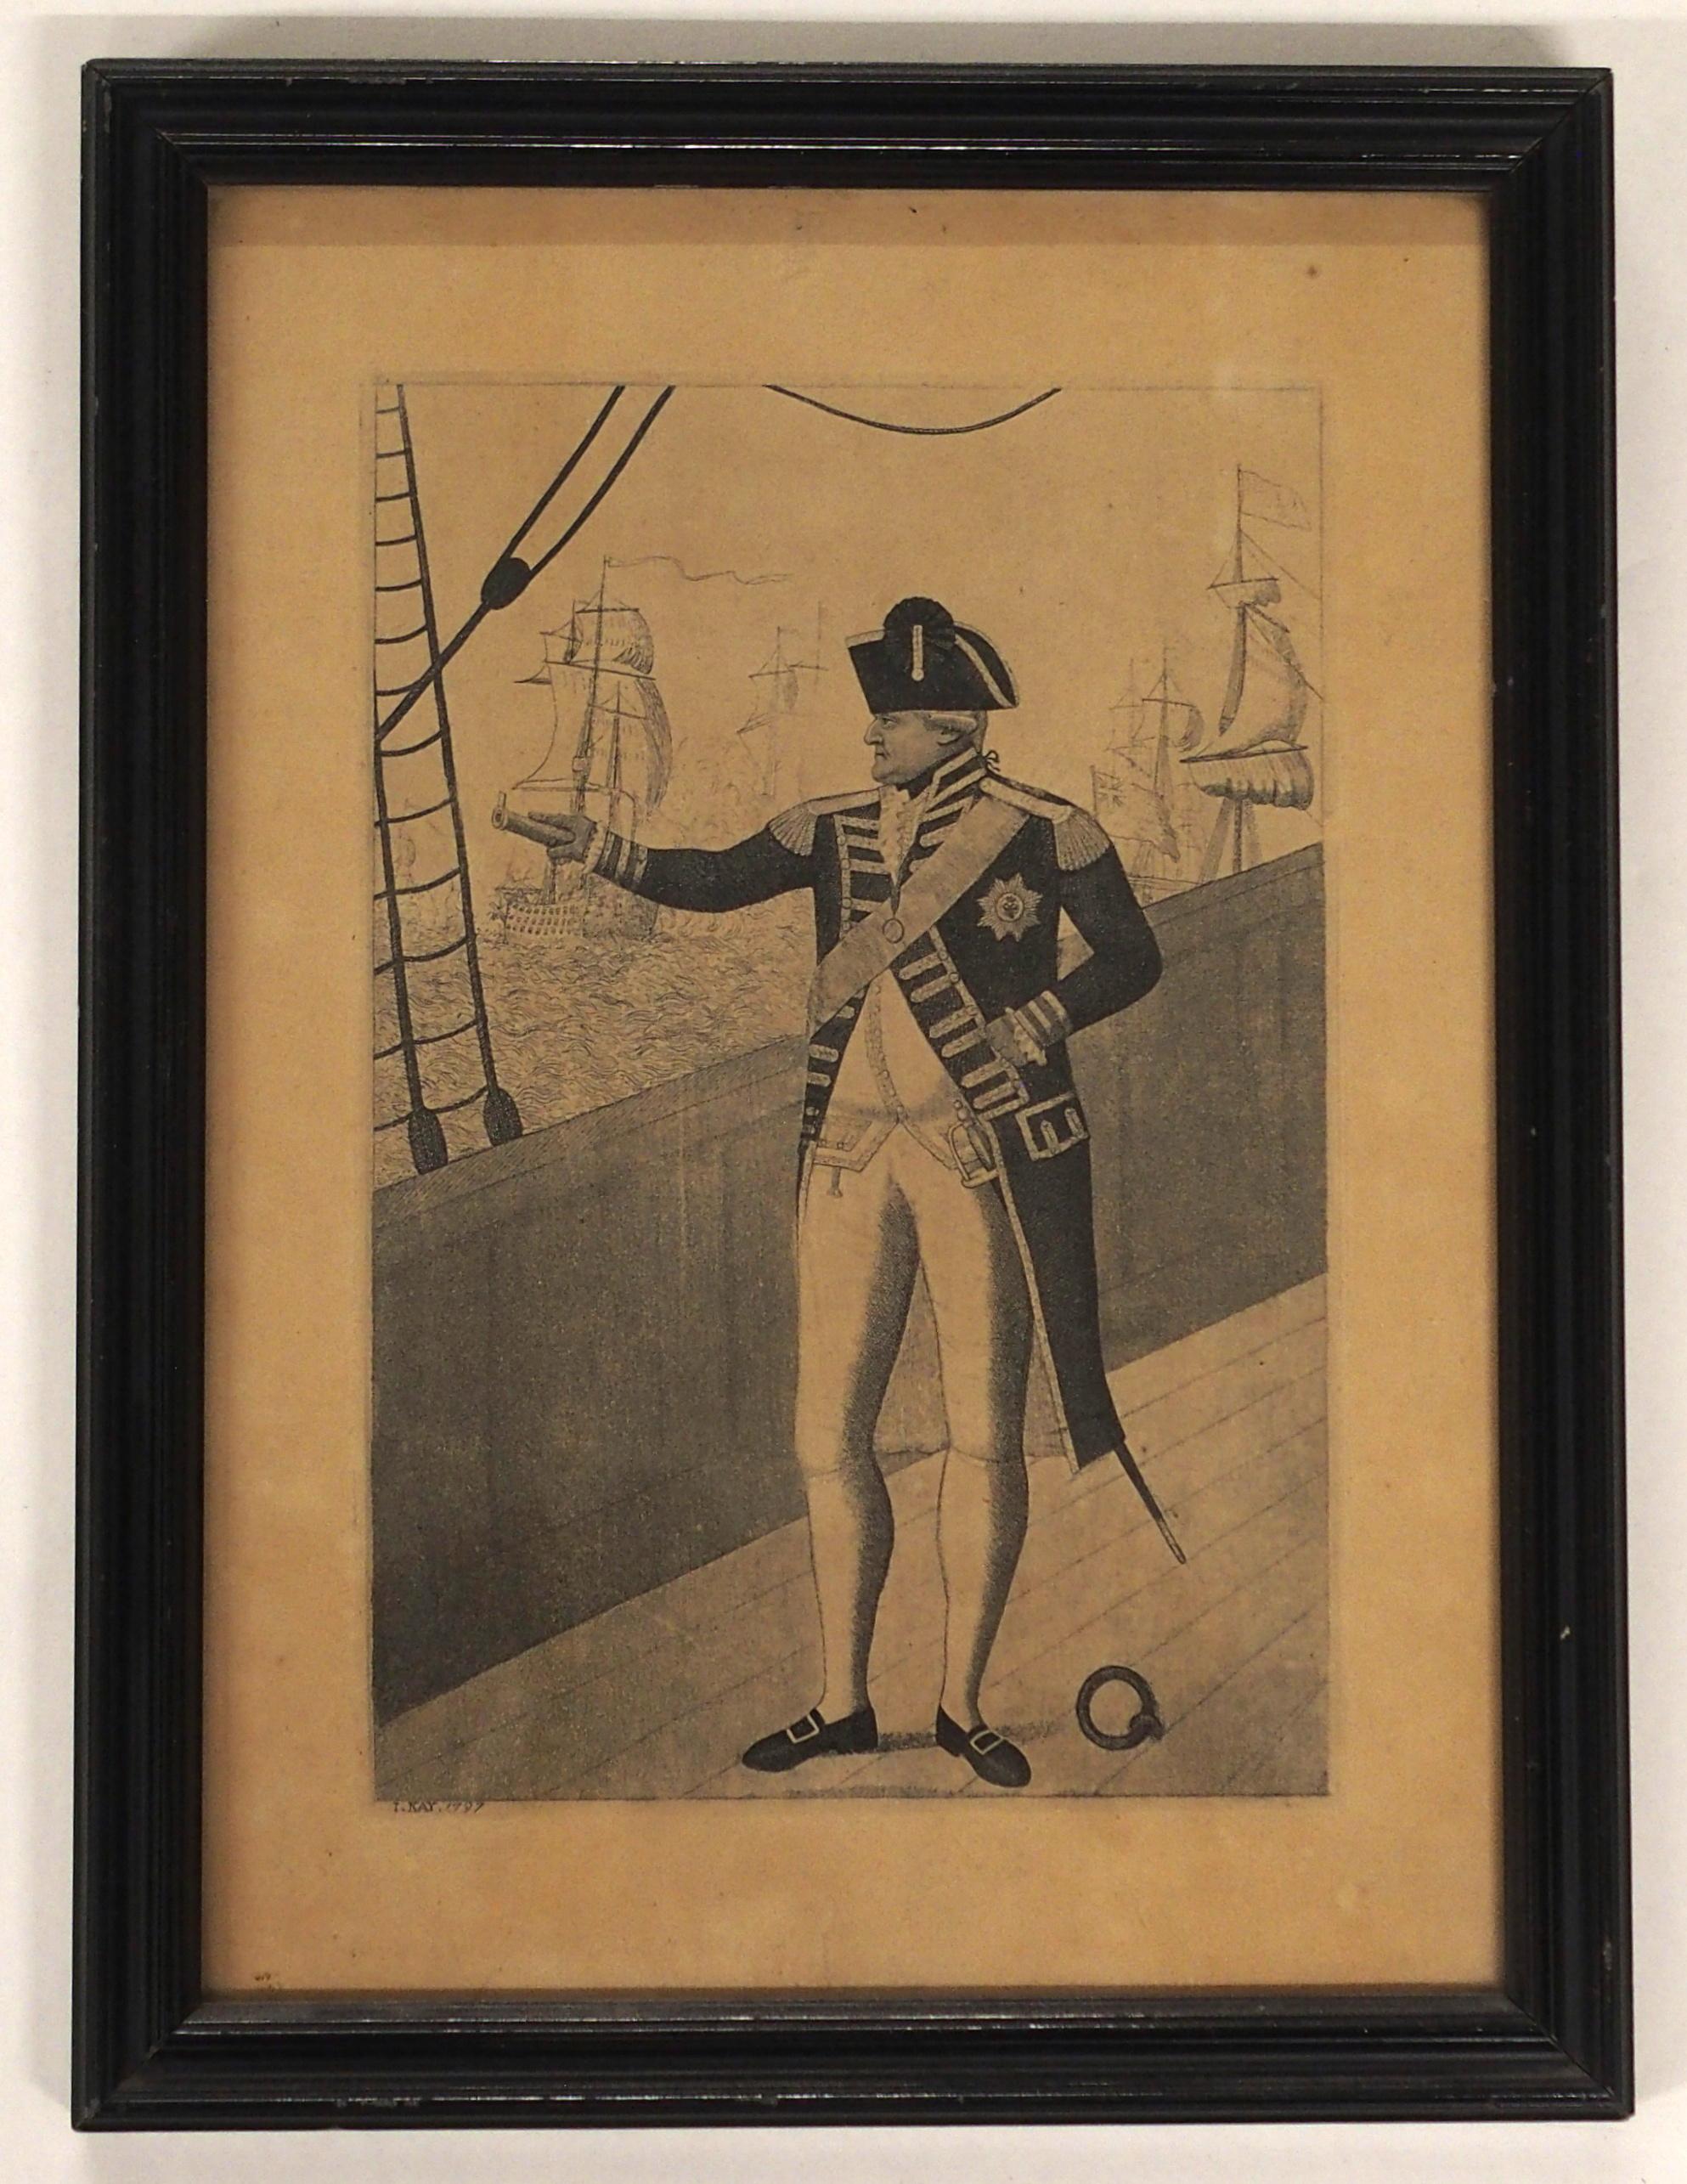 AFTER JOHN DUNCAN THE HEADLESS HORSEMAN engraving, 12 x 8cm, Admiral Viscount Duncan print, three - Image 8 of 12